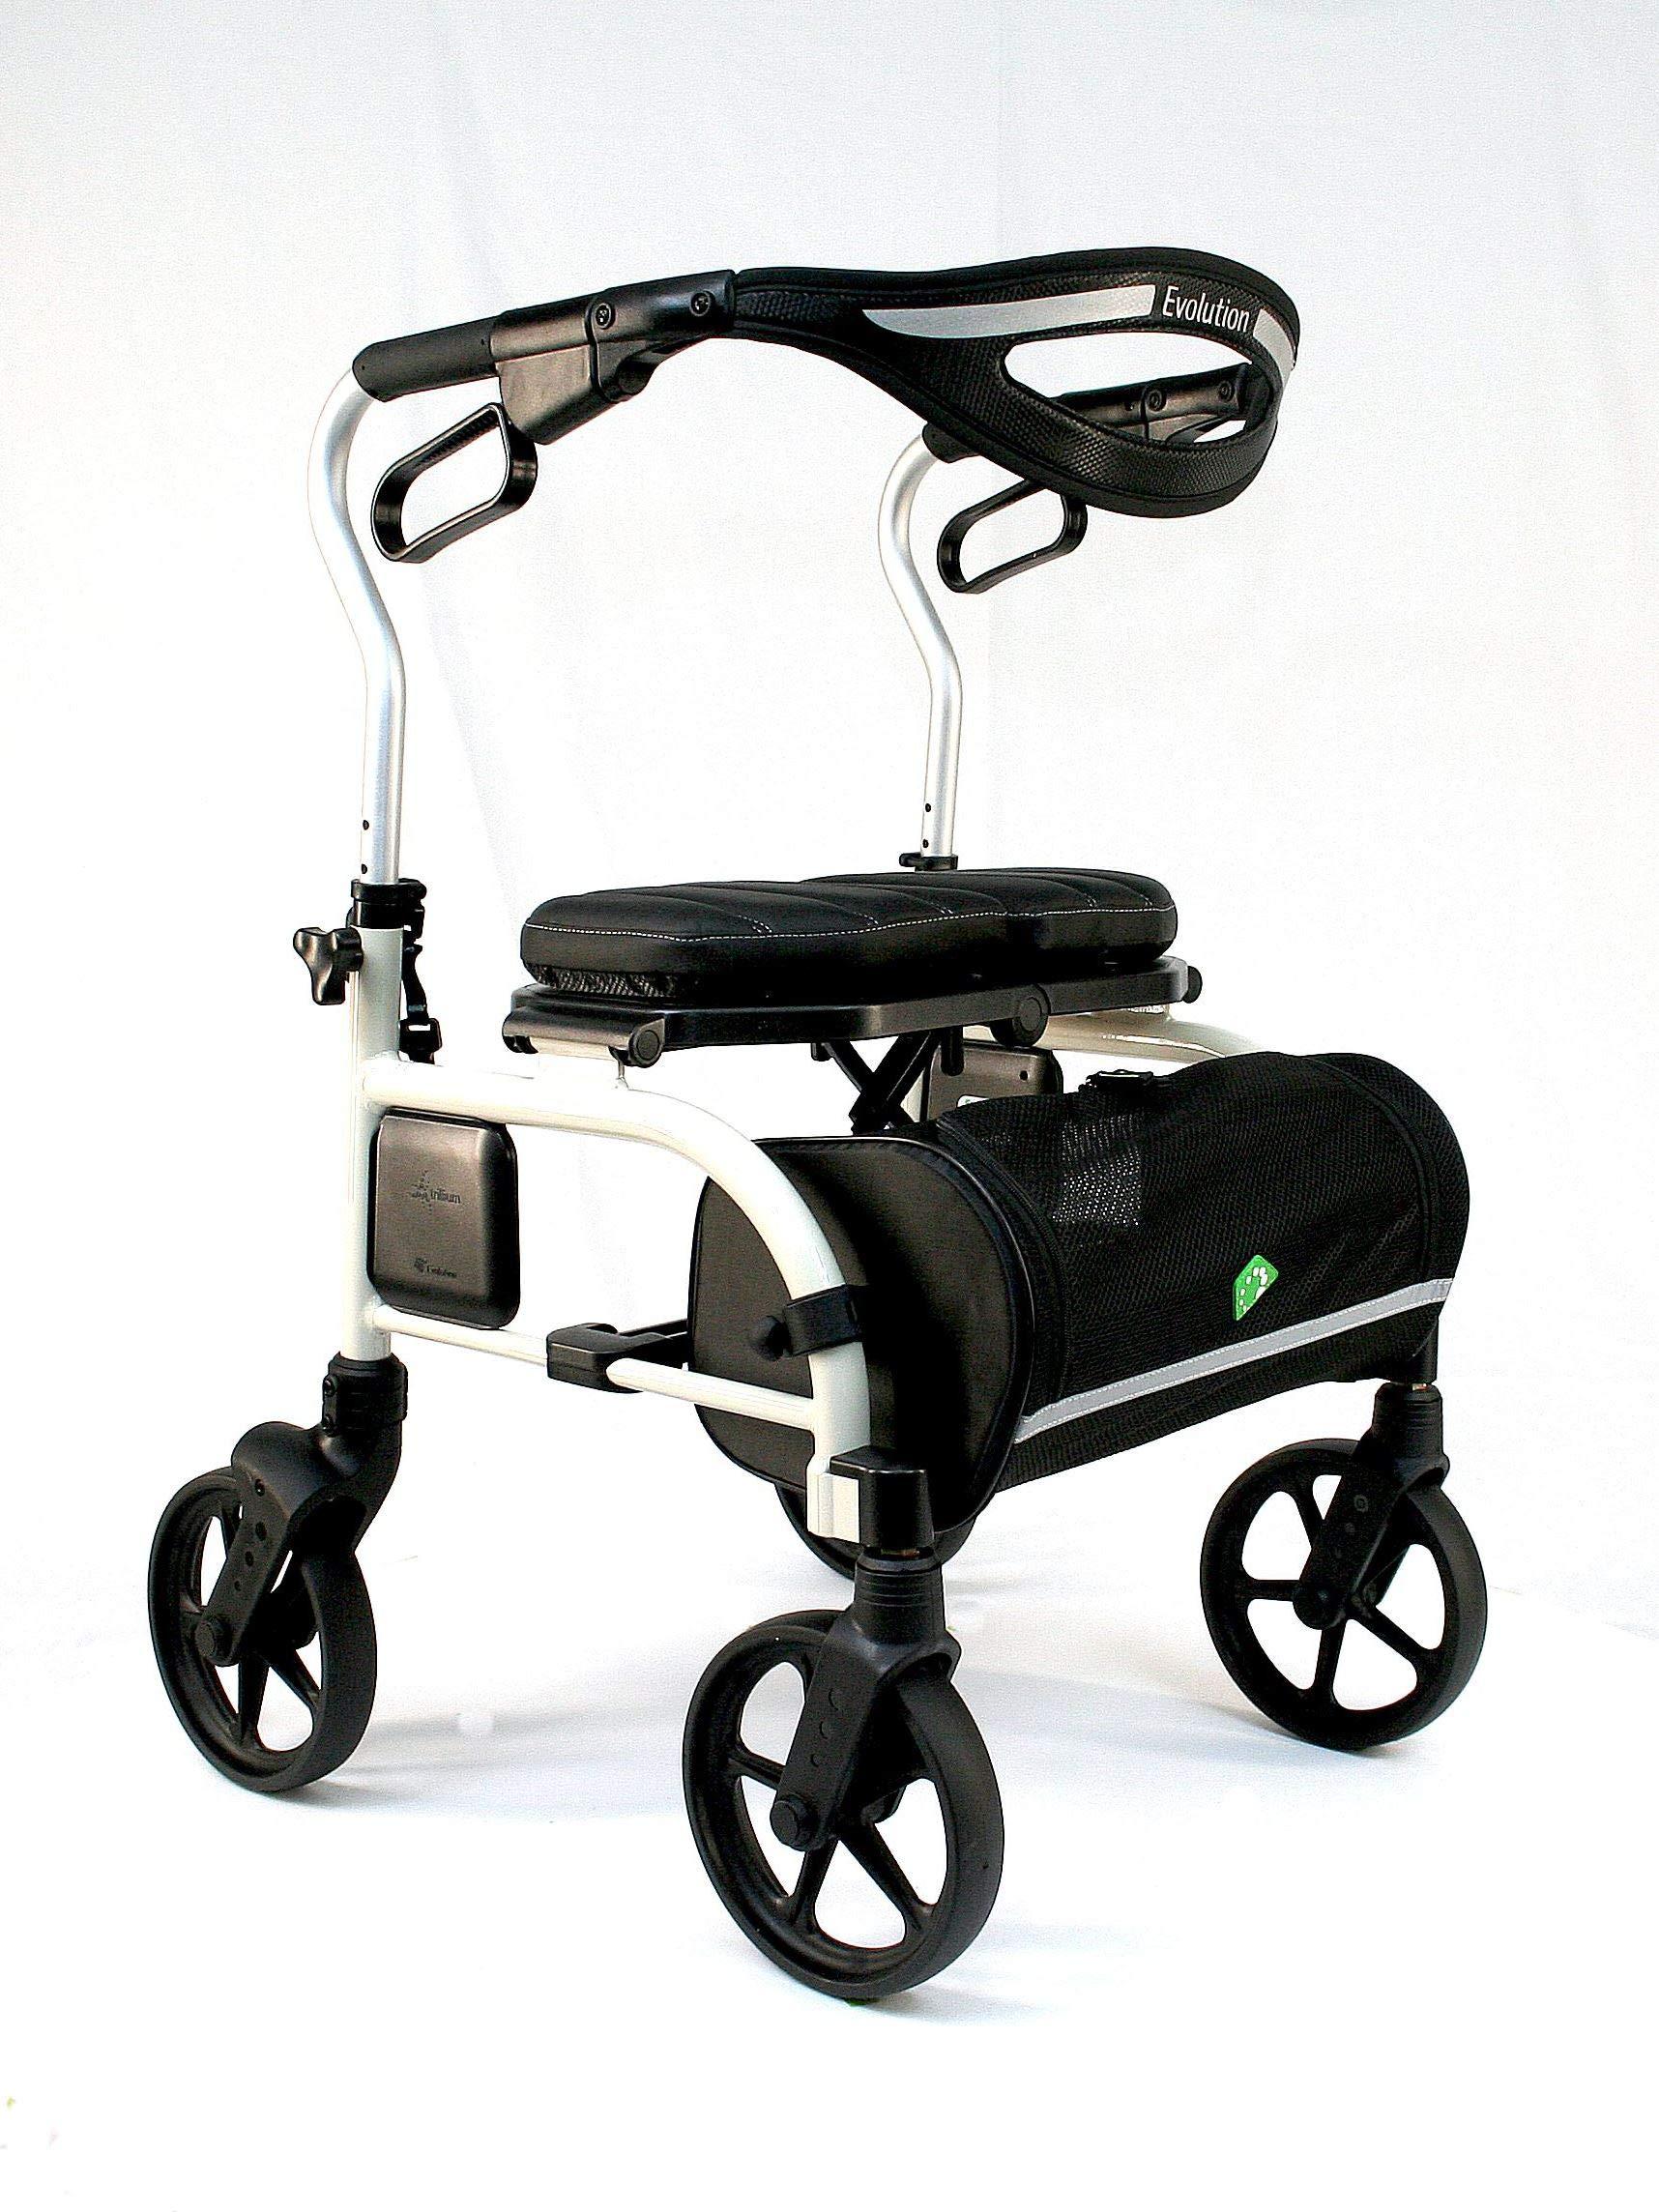 Evolution Trillium Lightweight Medical Walker Rollator with Seat, Large Wheels, Brakes, Backrest, Basket for Seniors Indoor Outdoor use (Pearl White, Regular)